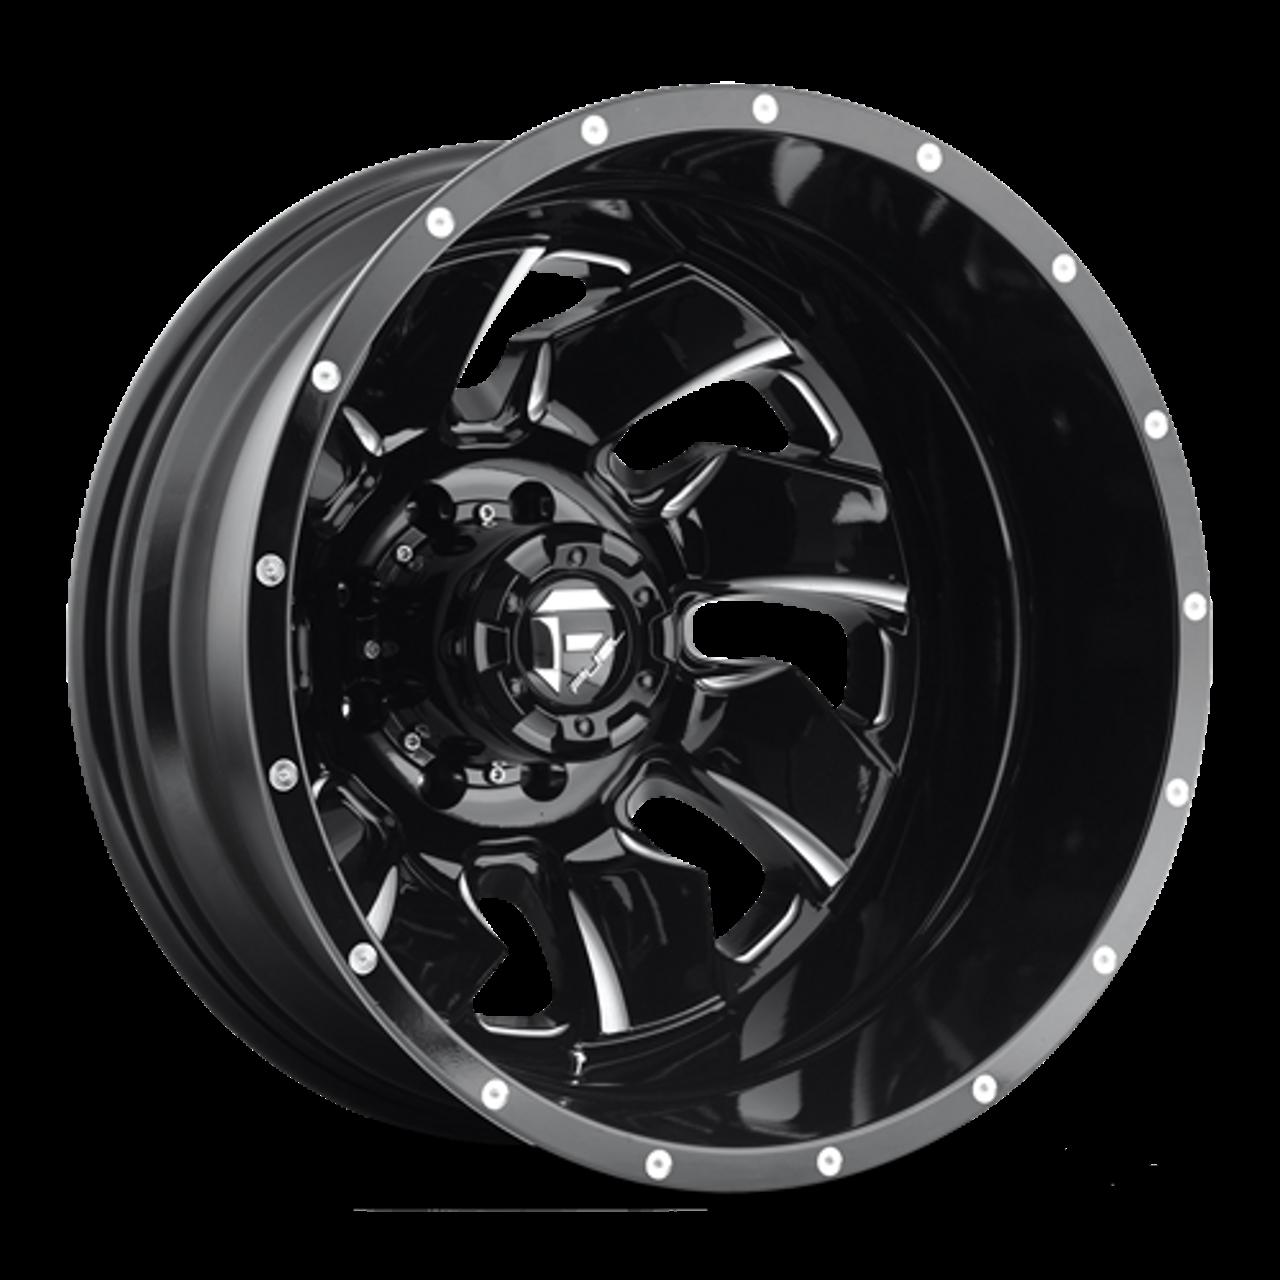 22 x 8.25 Fuel Cleaver D574 Black Machined